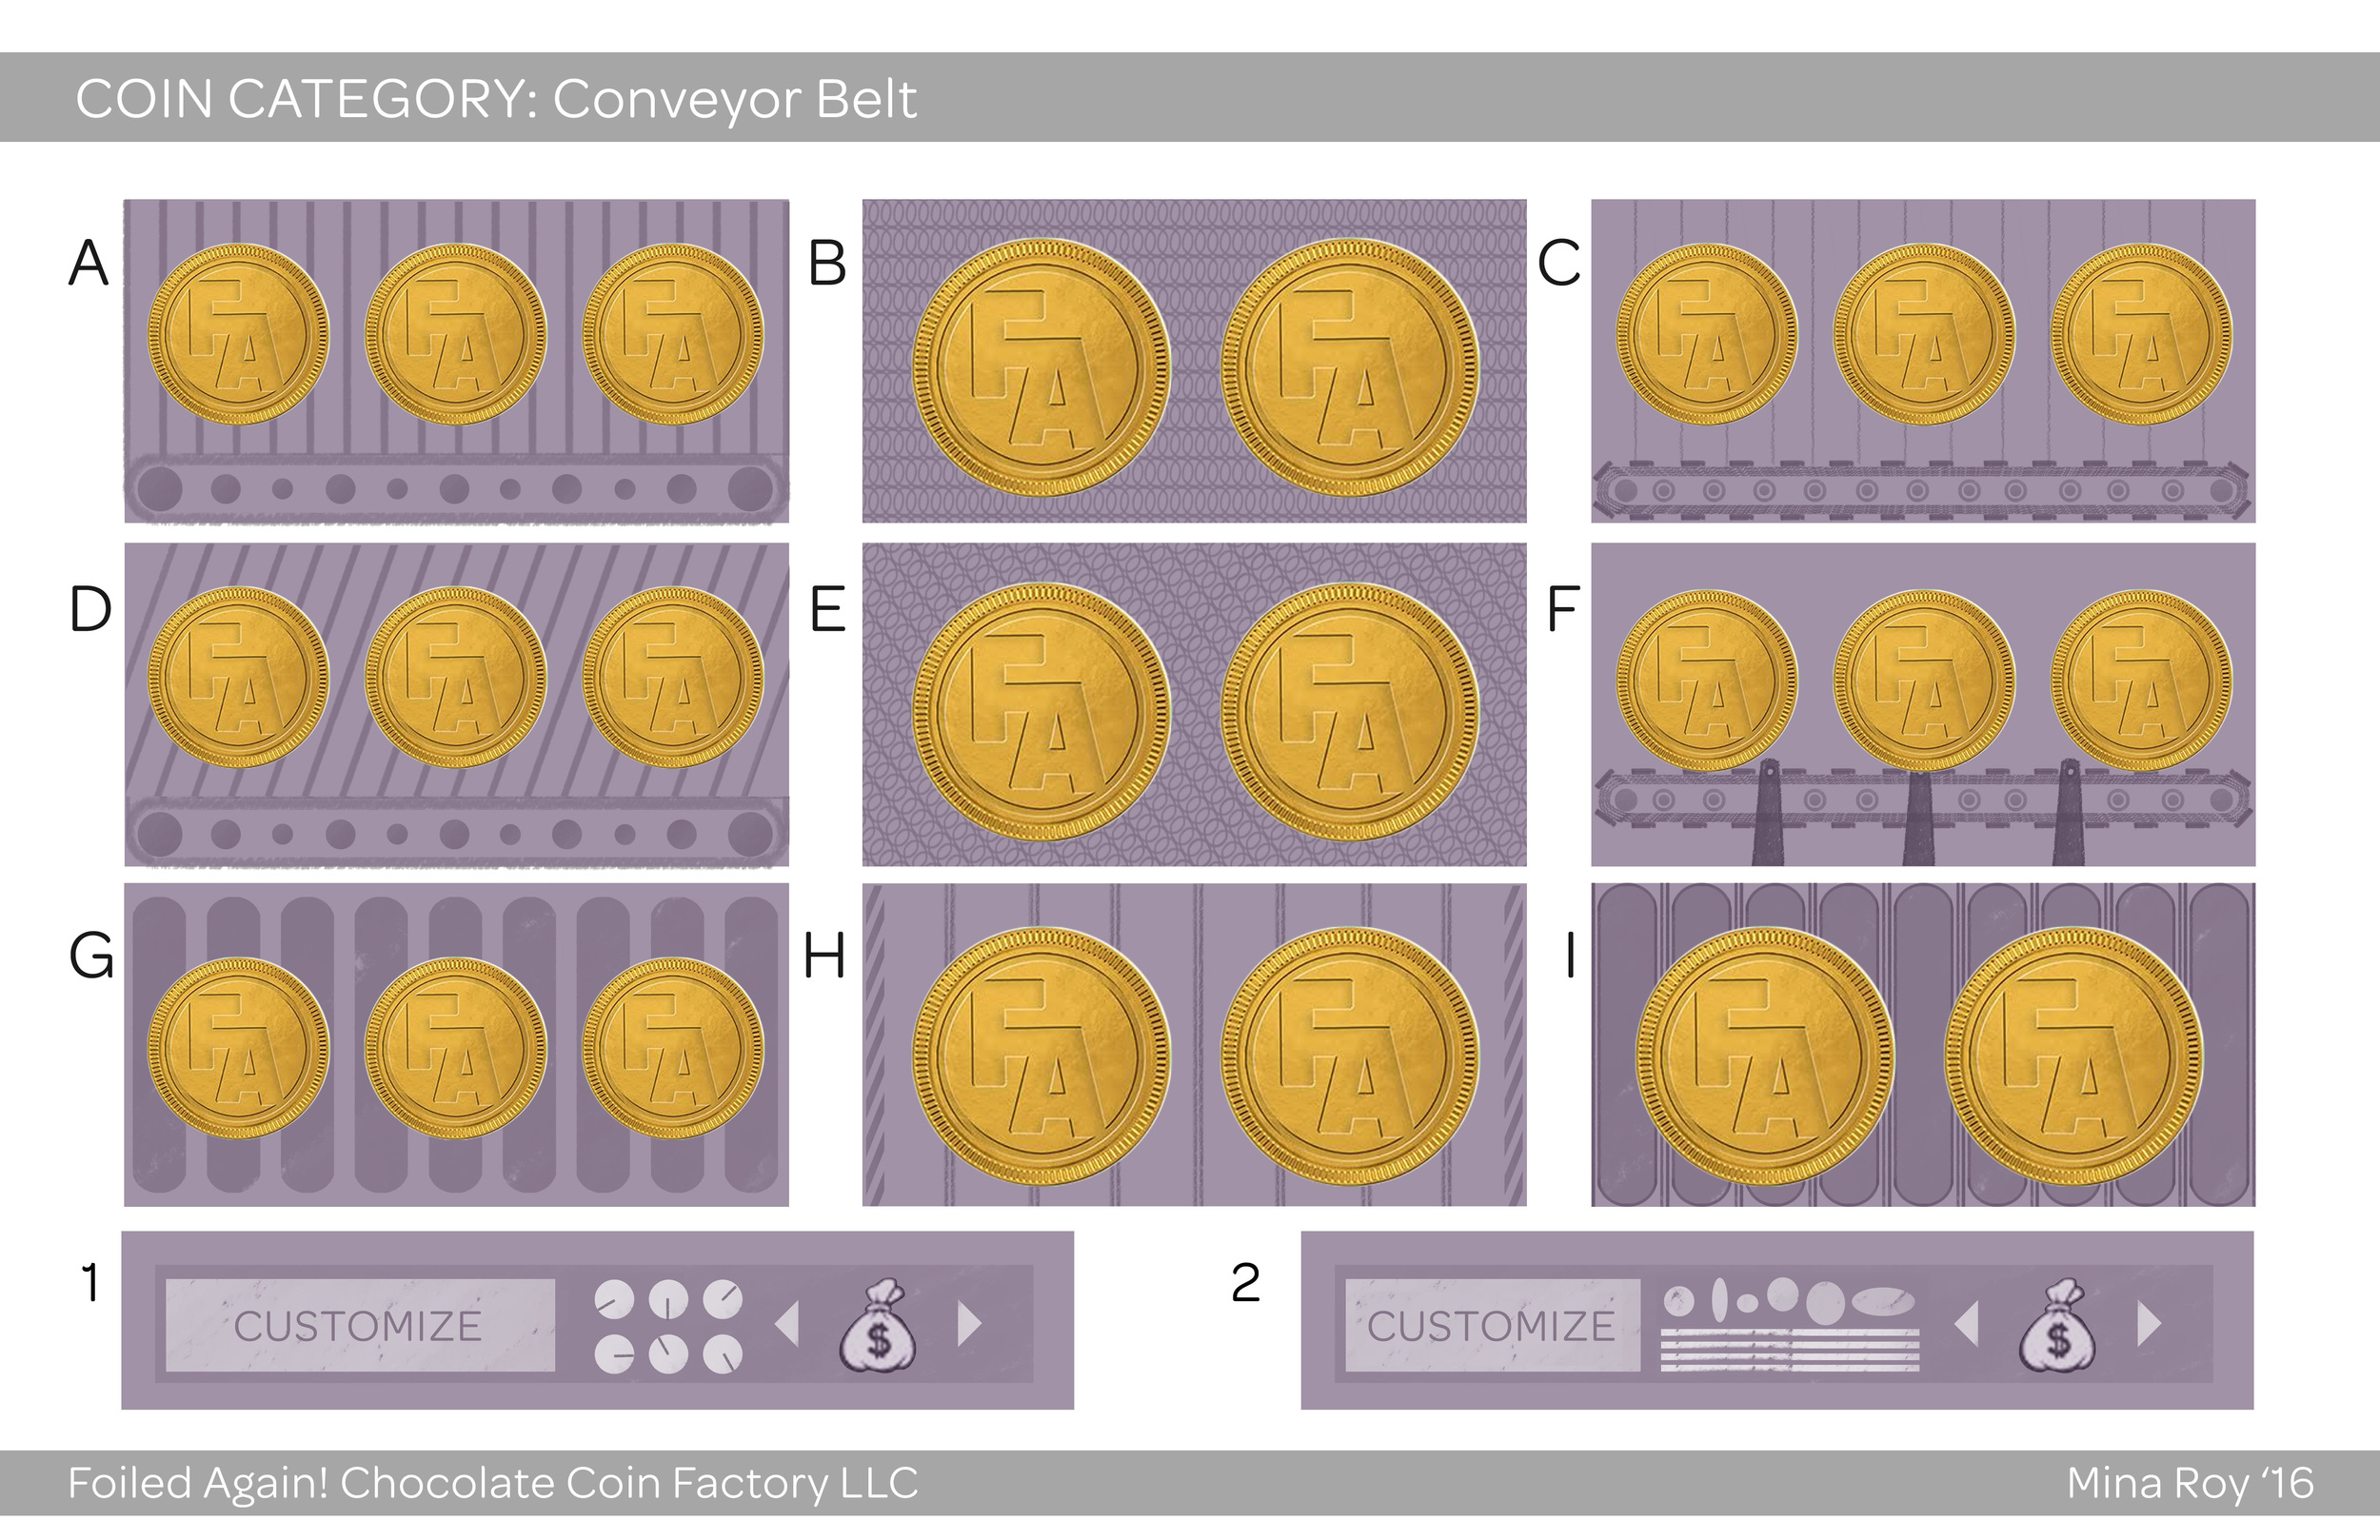 website-coincategory-conveyorbelt.jpg